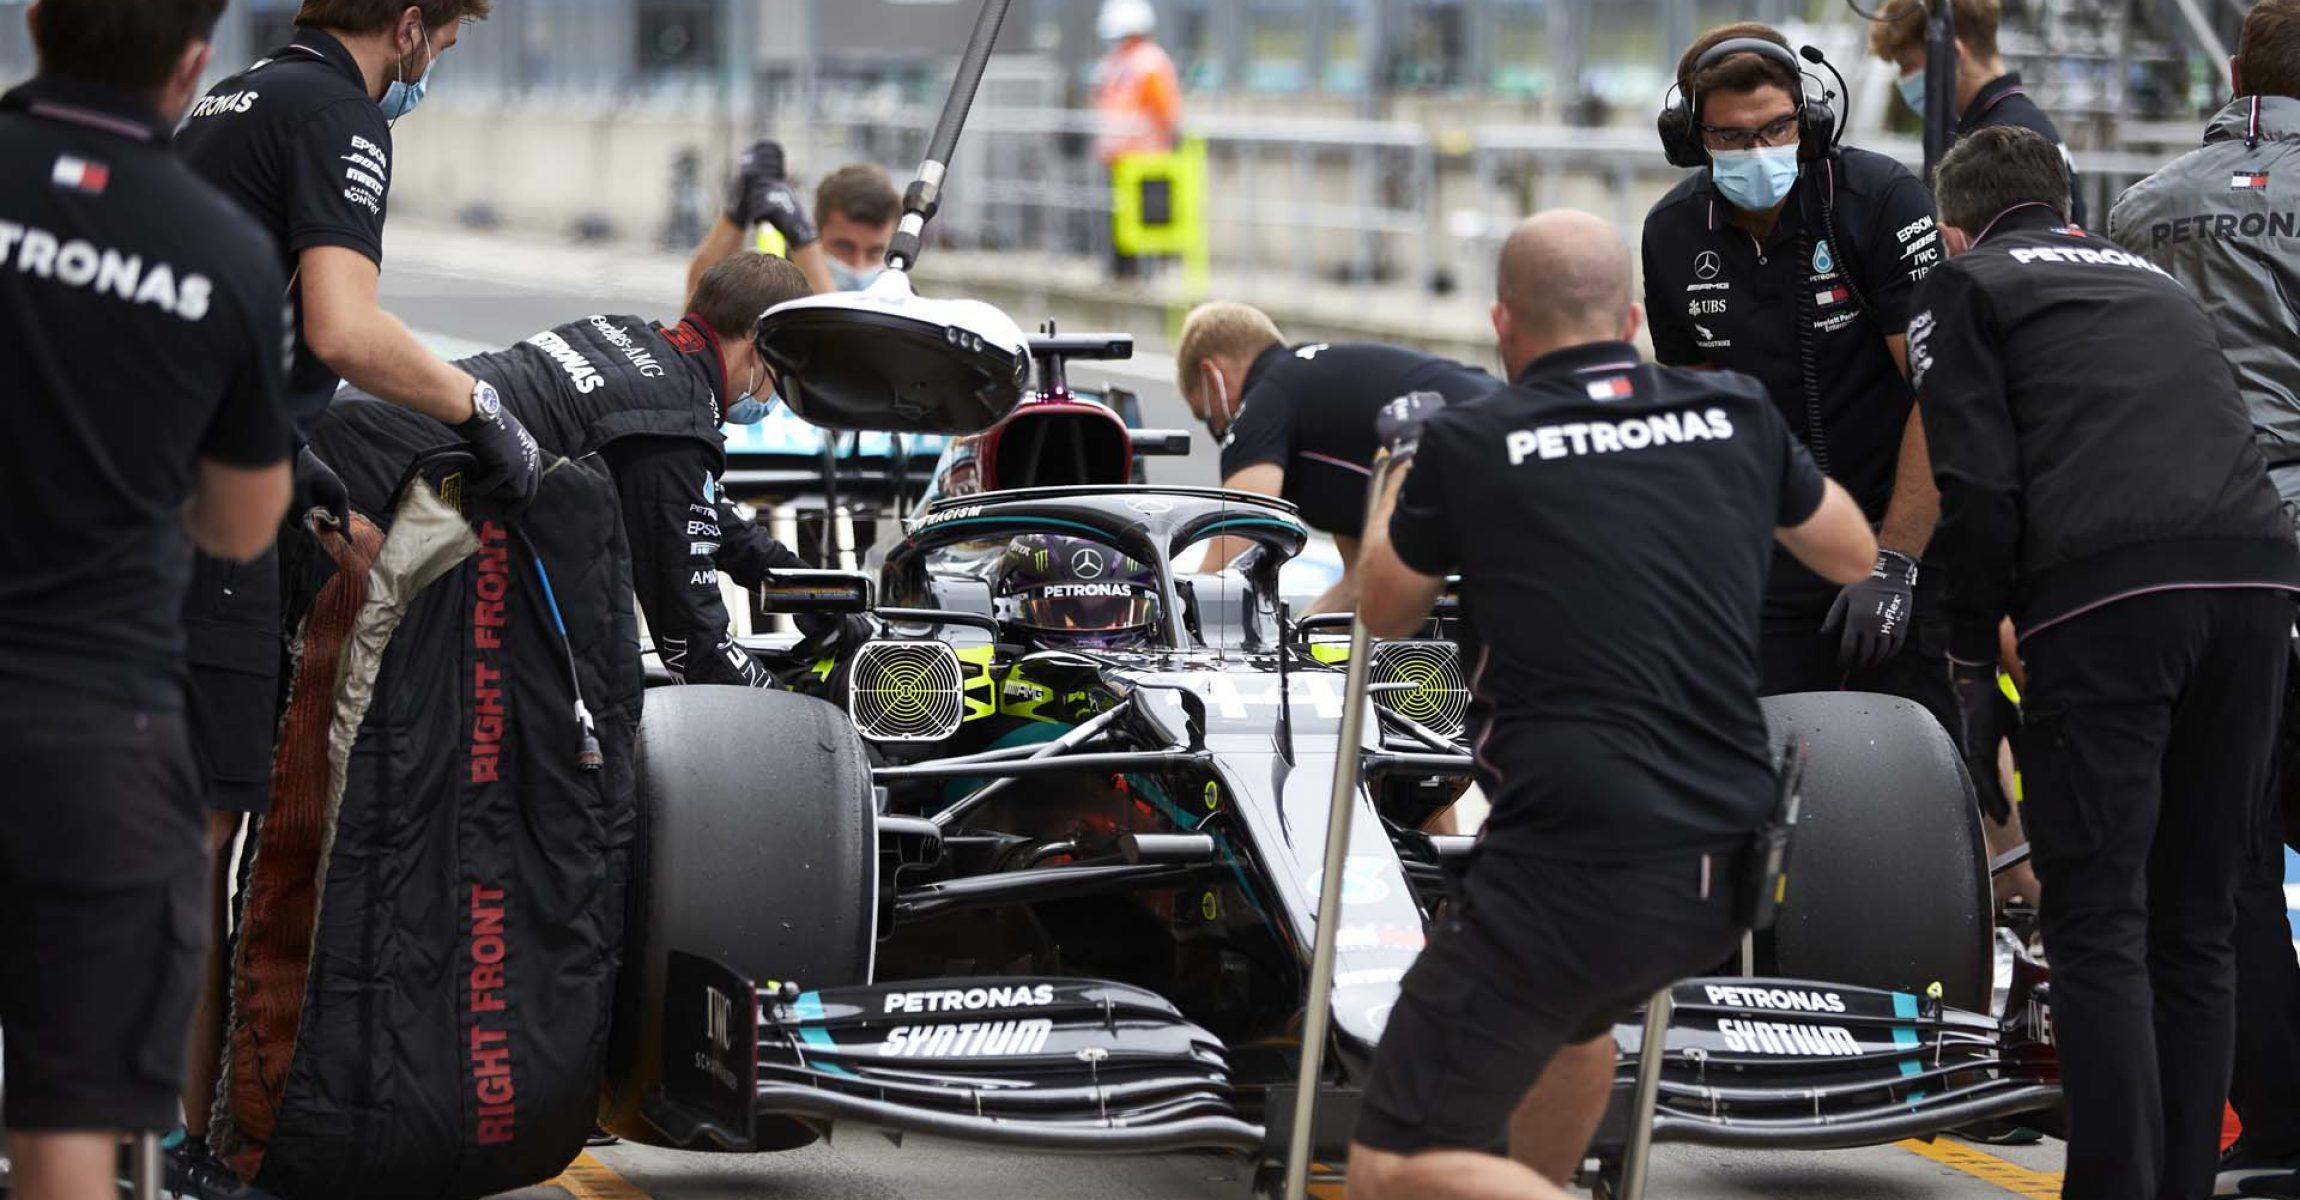 2020 Hungarian Grand Prix, Friday - Steve Etherington Lewis Hamilton Mercedes